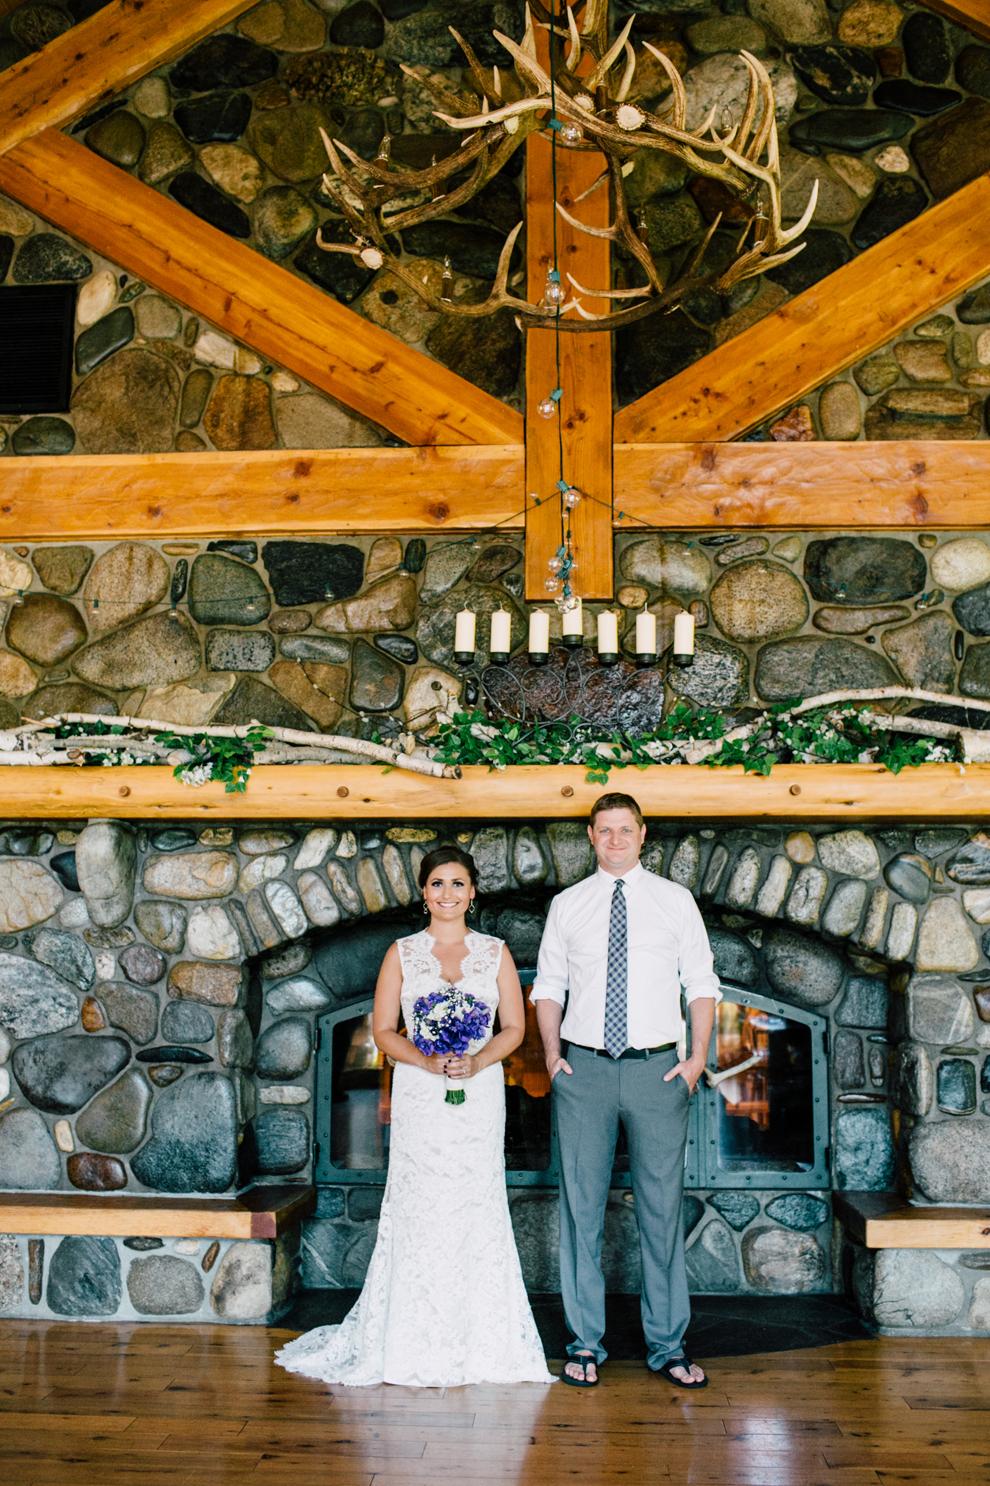 028-leavenworth-mountain-springs-lodge-wedding-karena-saul-katheryn-moran-photography.jpg